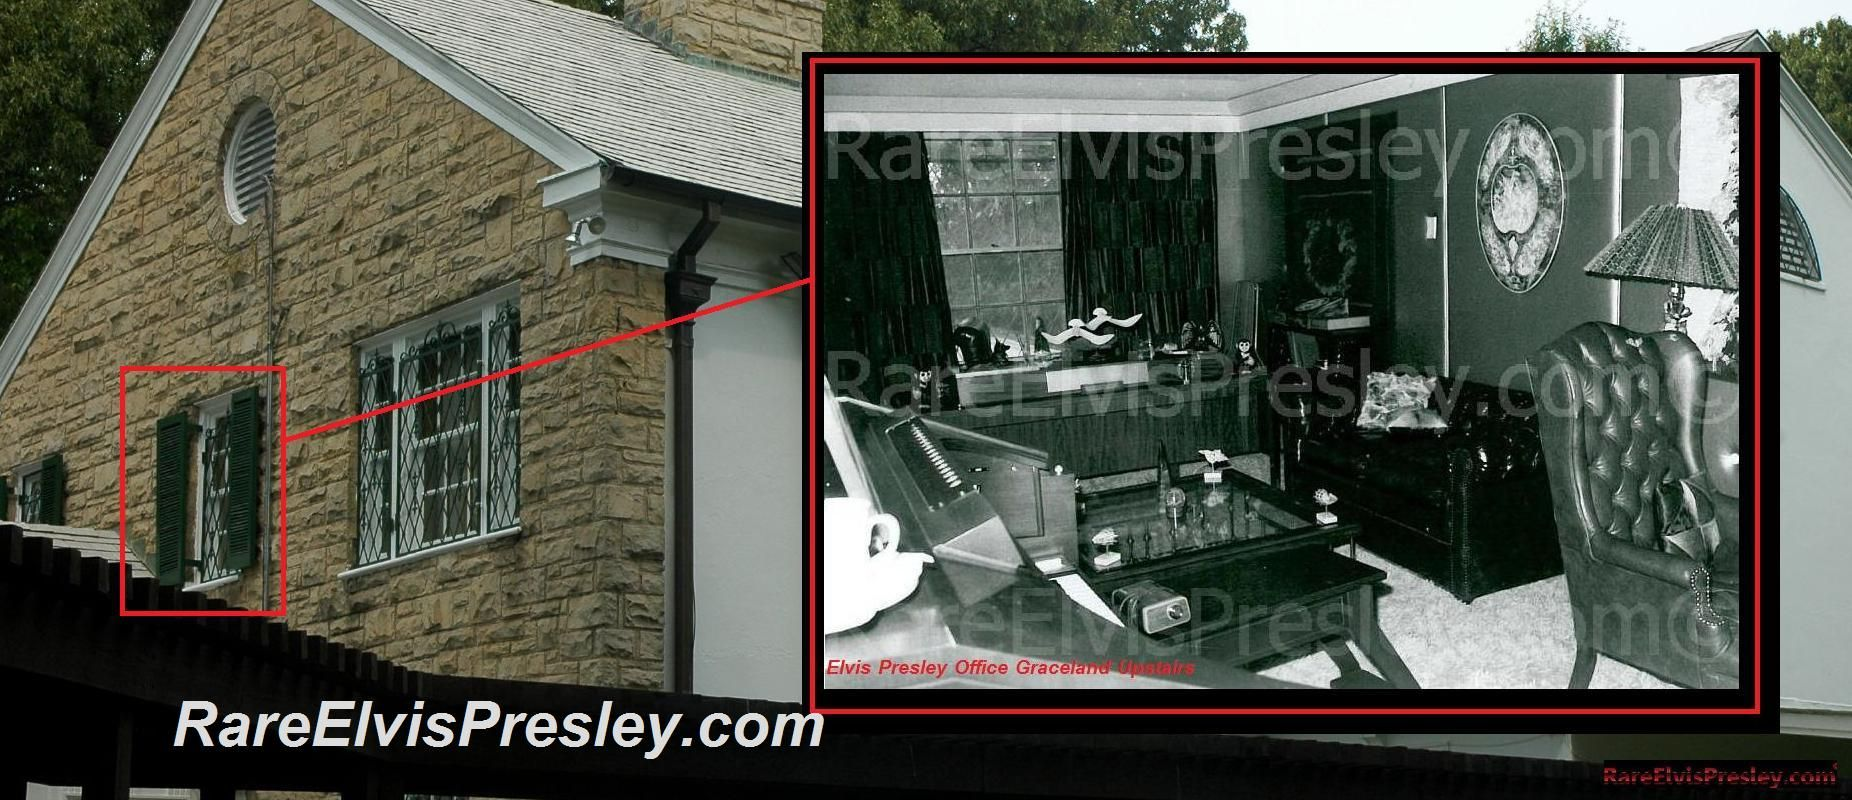 Elvis Presley Rare Photos Upstairs Graceland Page 2